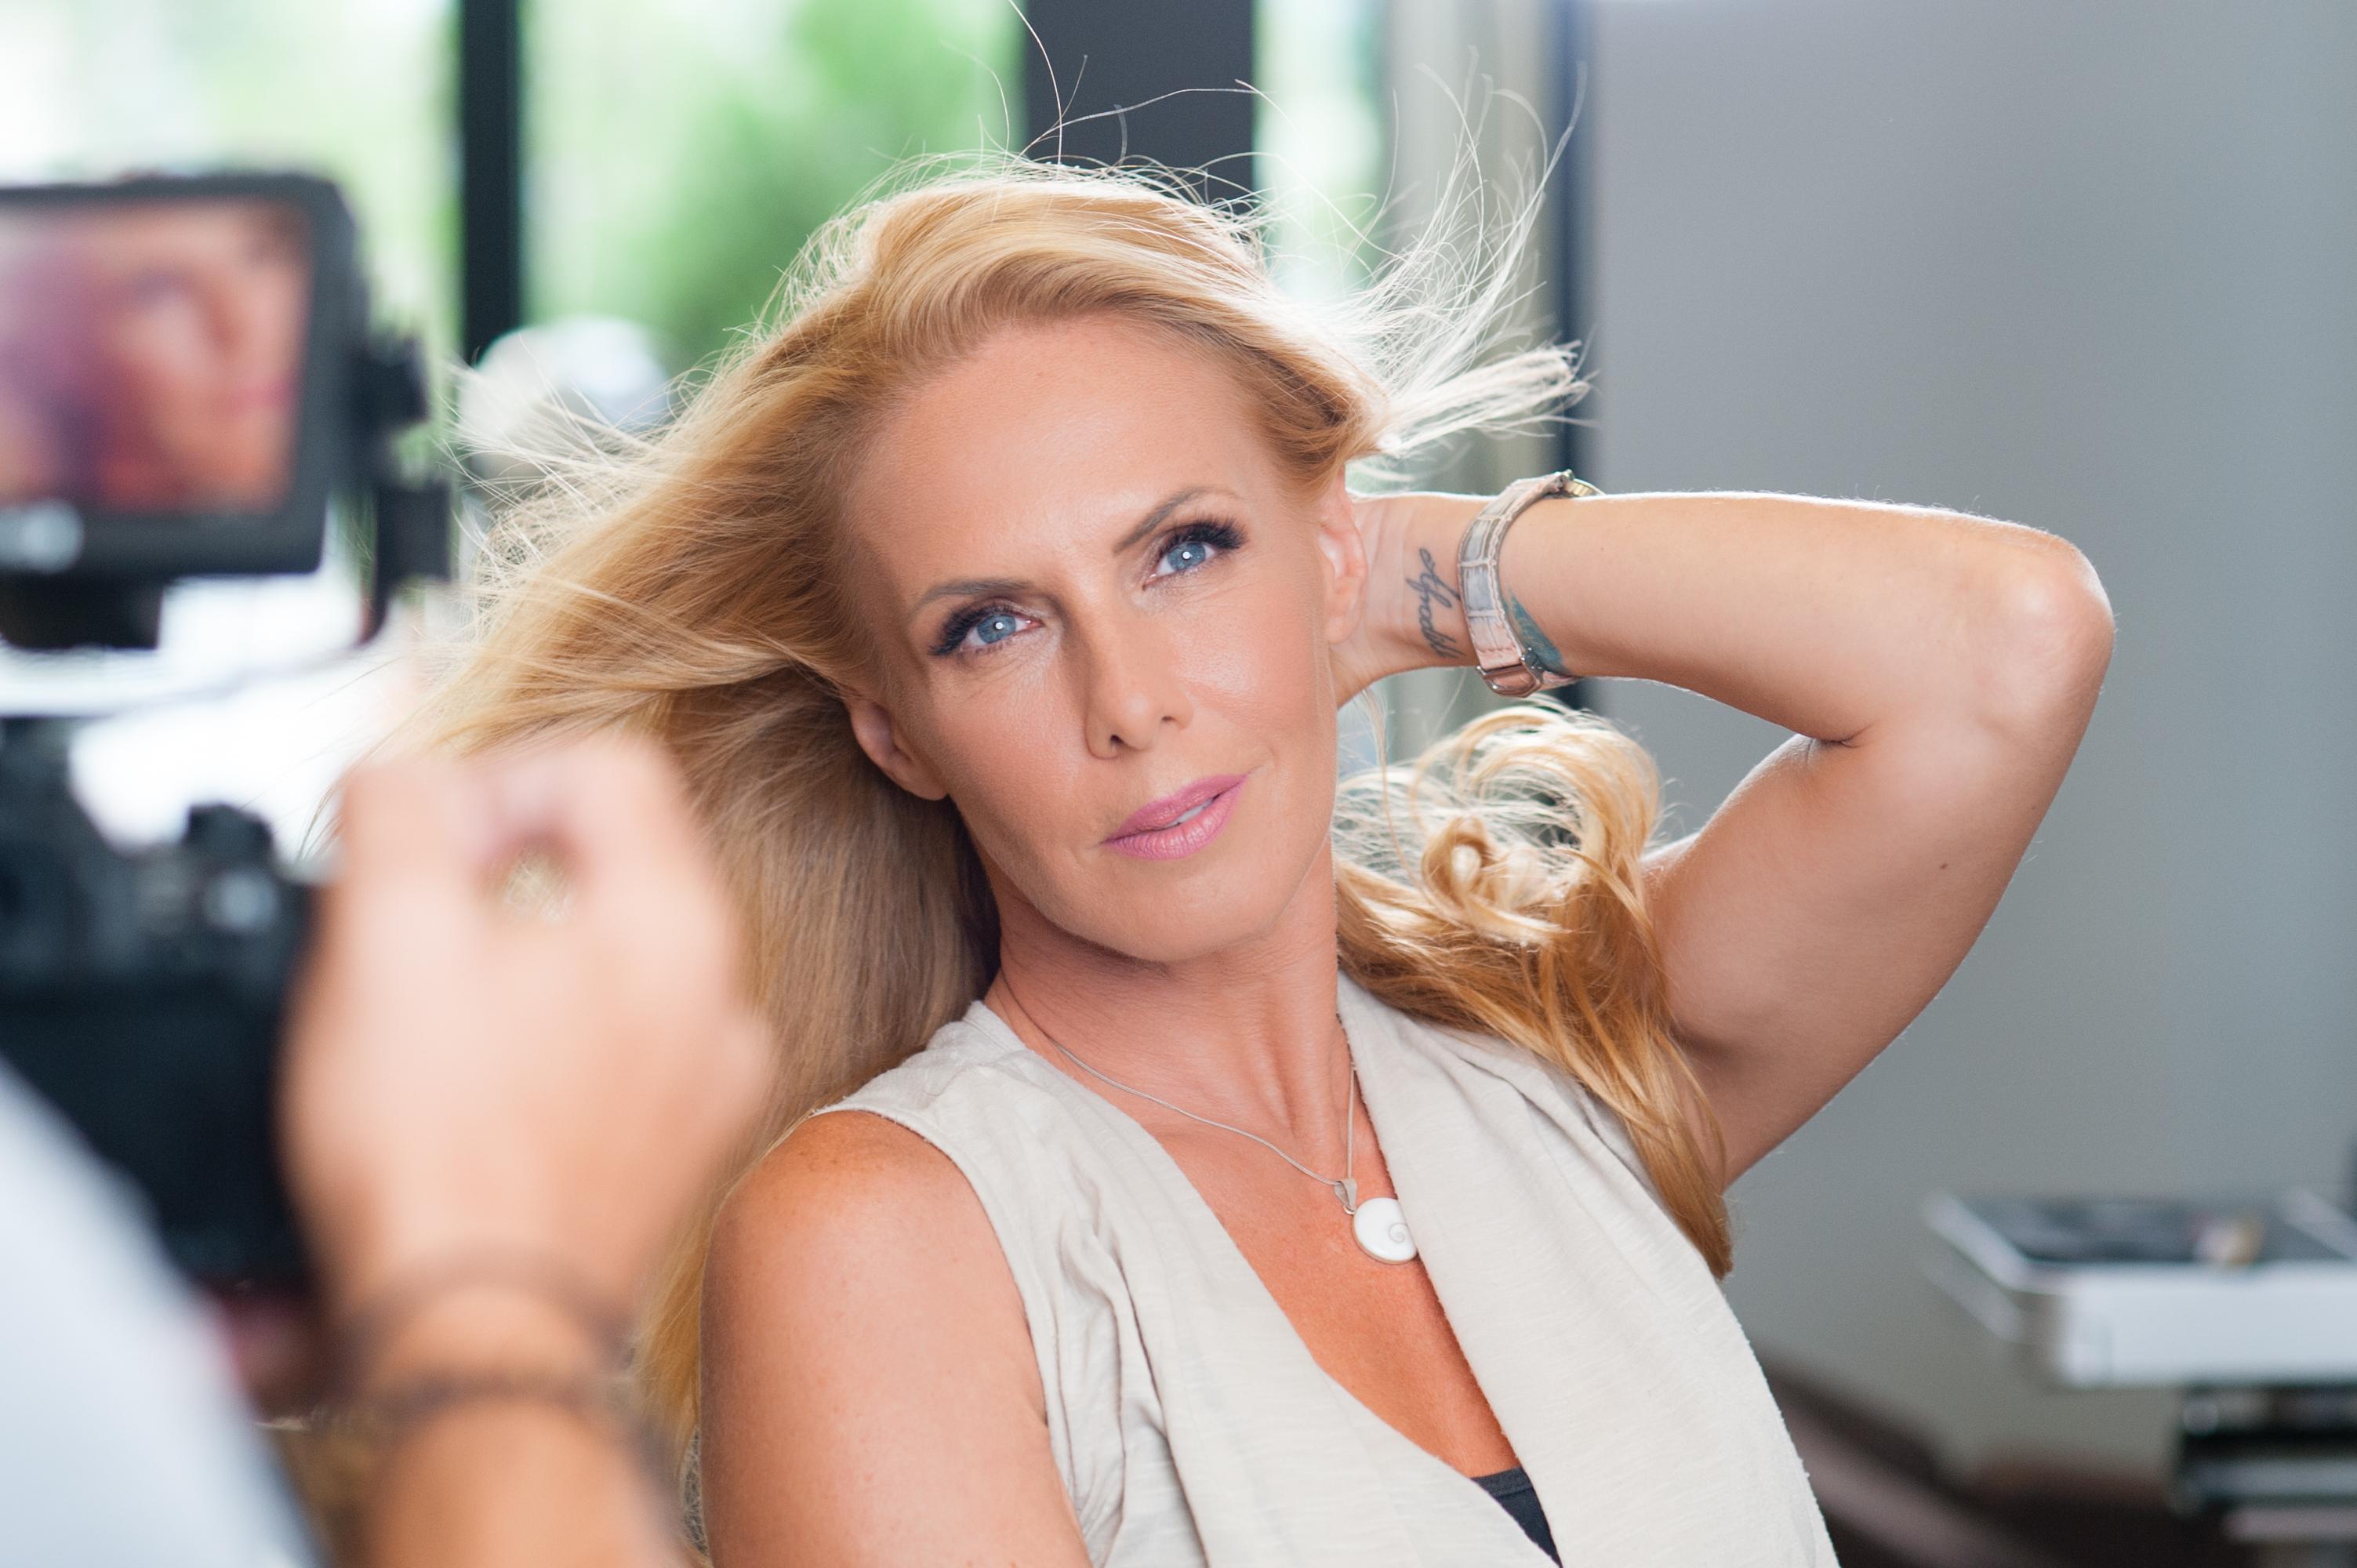 H Εβελίνα Παπούλια άλλαξε το χρώμα των μαλλιών της με την νέα Koleston Perfect Me+ της Wella! | tlife.gr